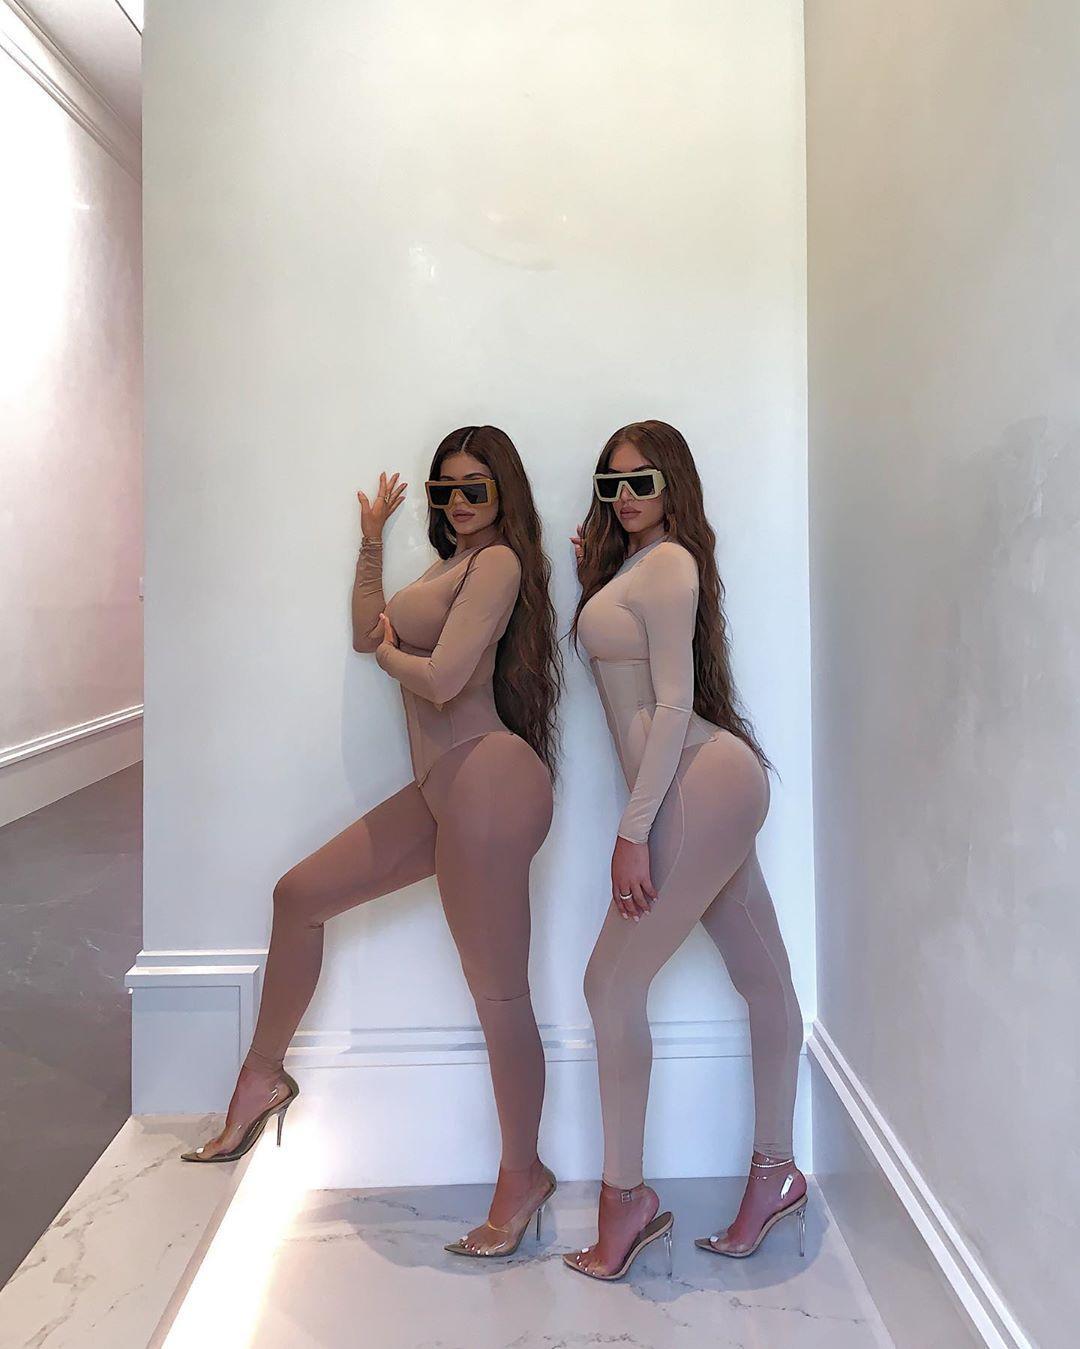 Kylie Jenner Lesbian Bikini Haul Photoshoot Leaked